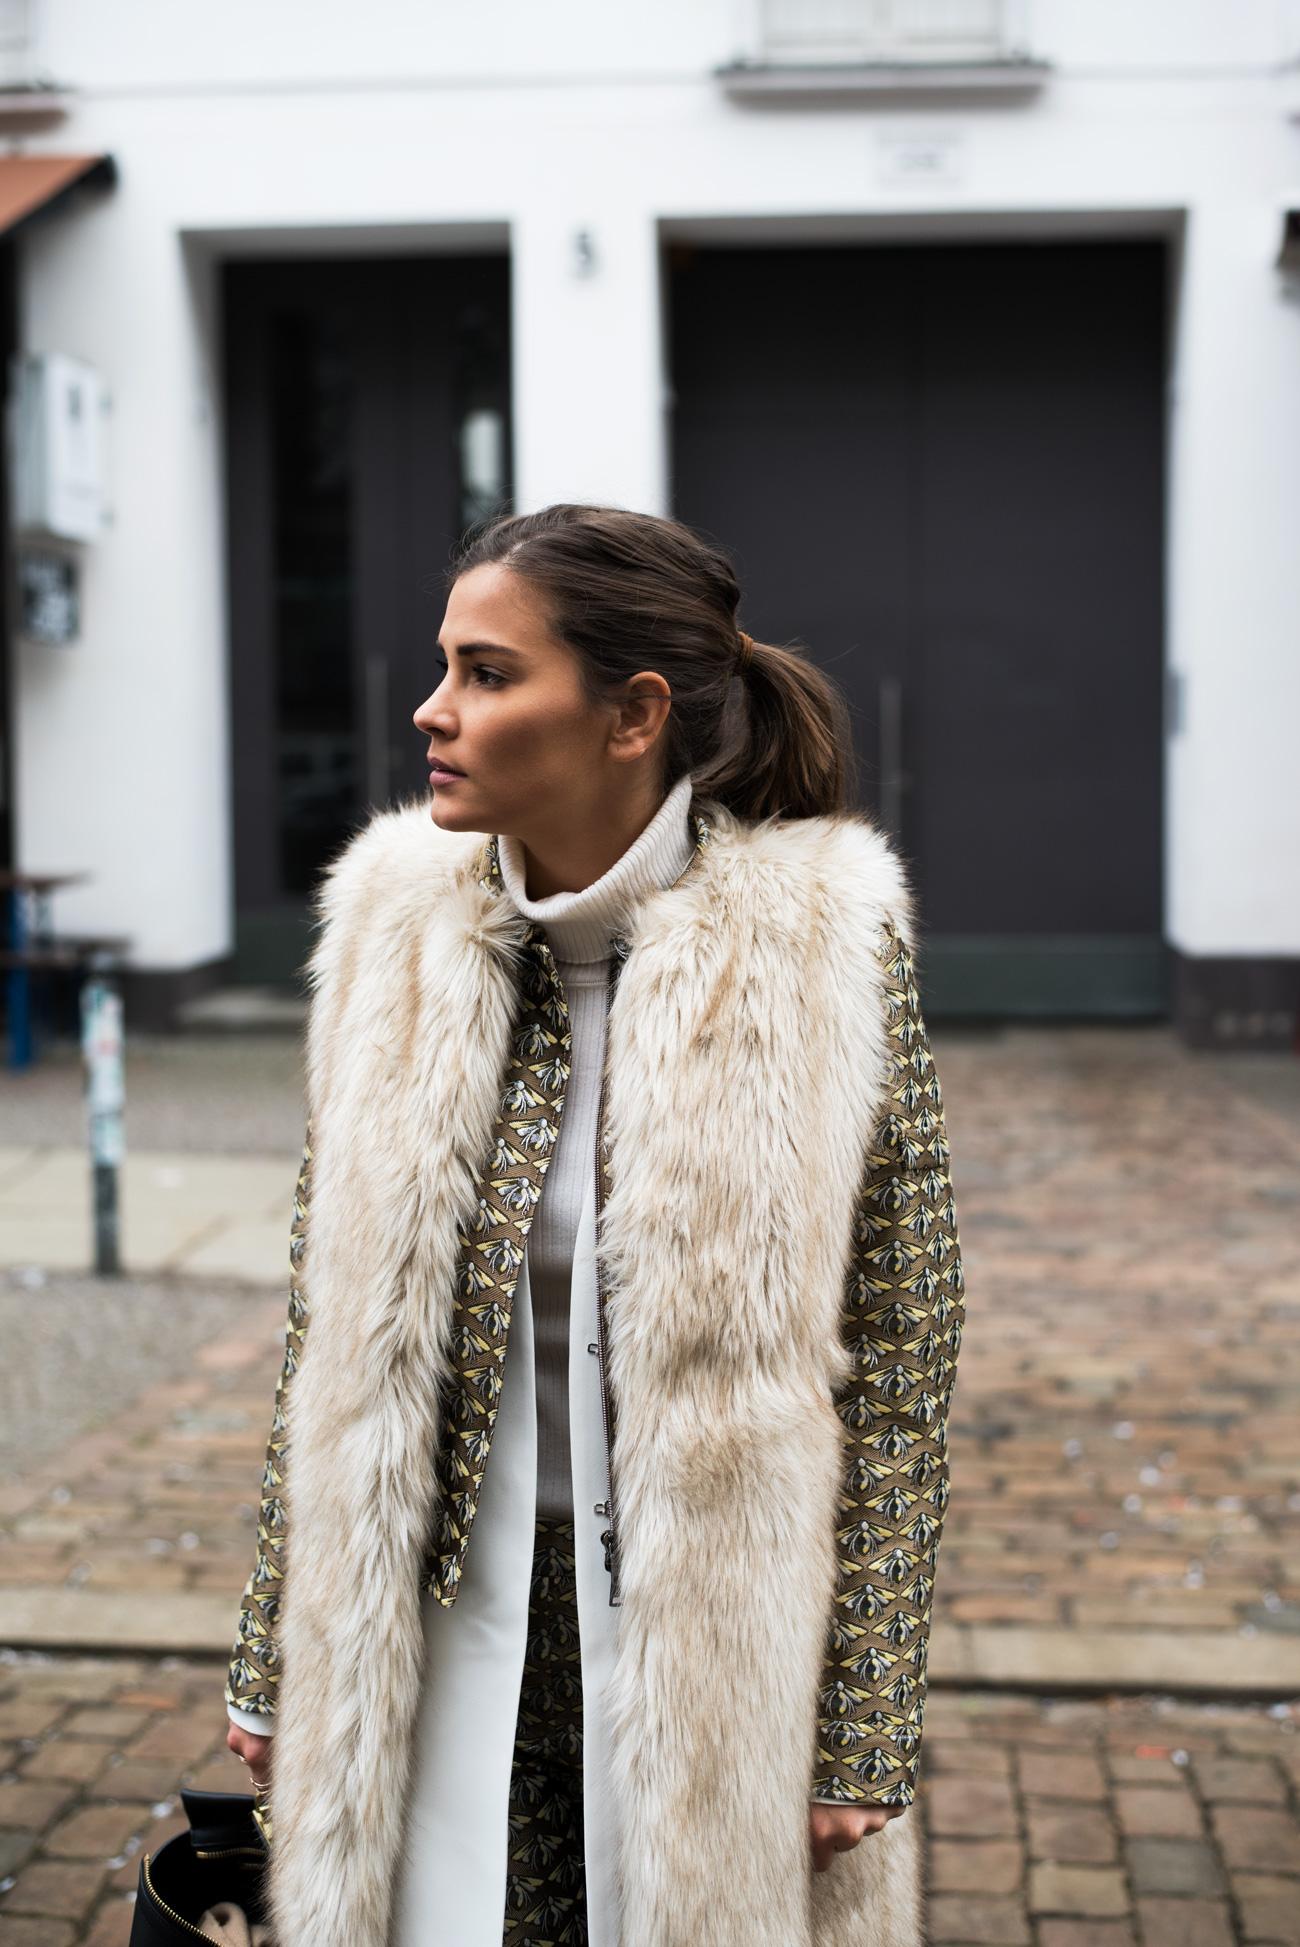 Luisa-cerano-hosen-anzug-stoff-hose-und-kurze-jacke-mit-print-blogger-streetstyle-berlin-fashion-week-januar-2017-fake-fur-weste-kunstfell-nina-fashiioncarpet